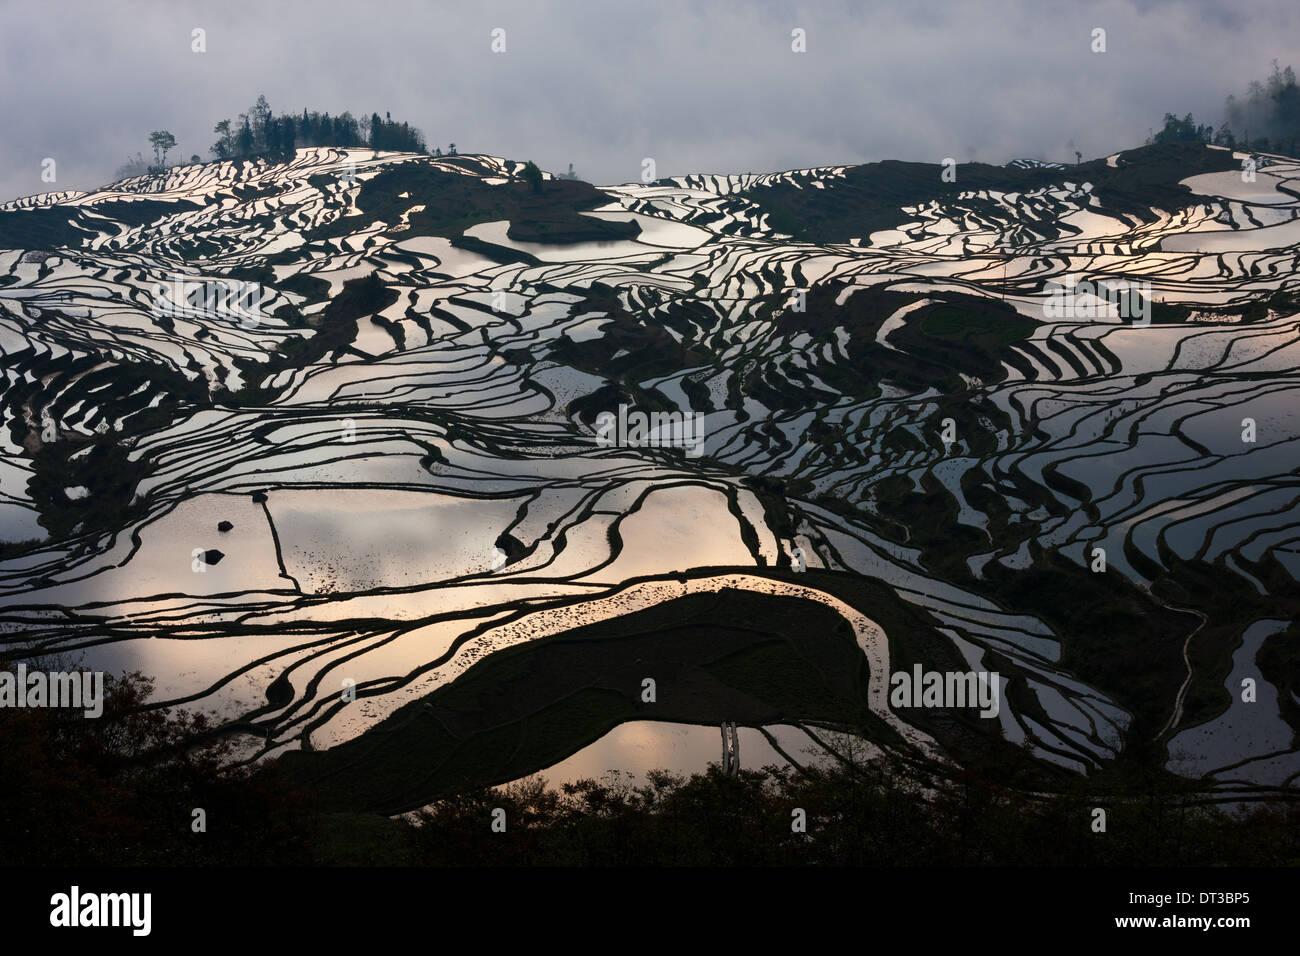 Terraced rice fields, Yuanyang, China - Stock Image